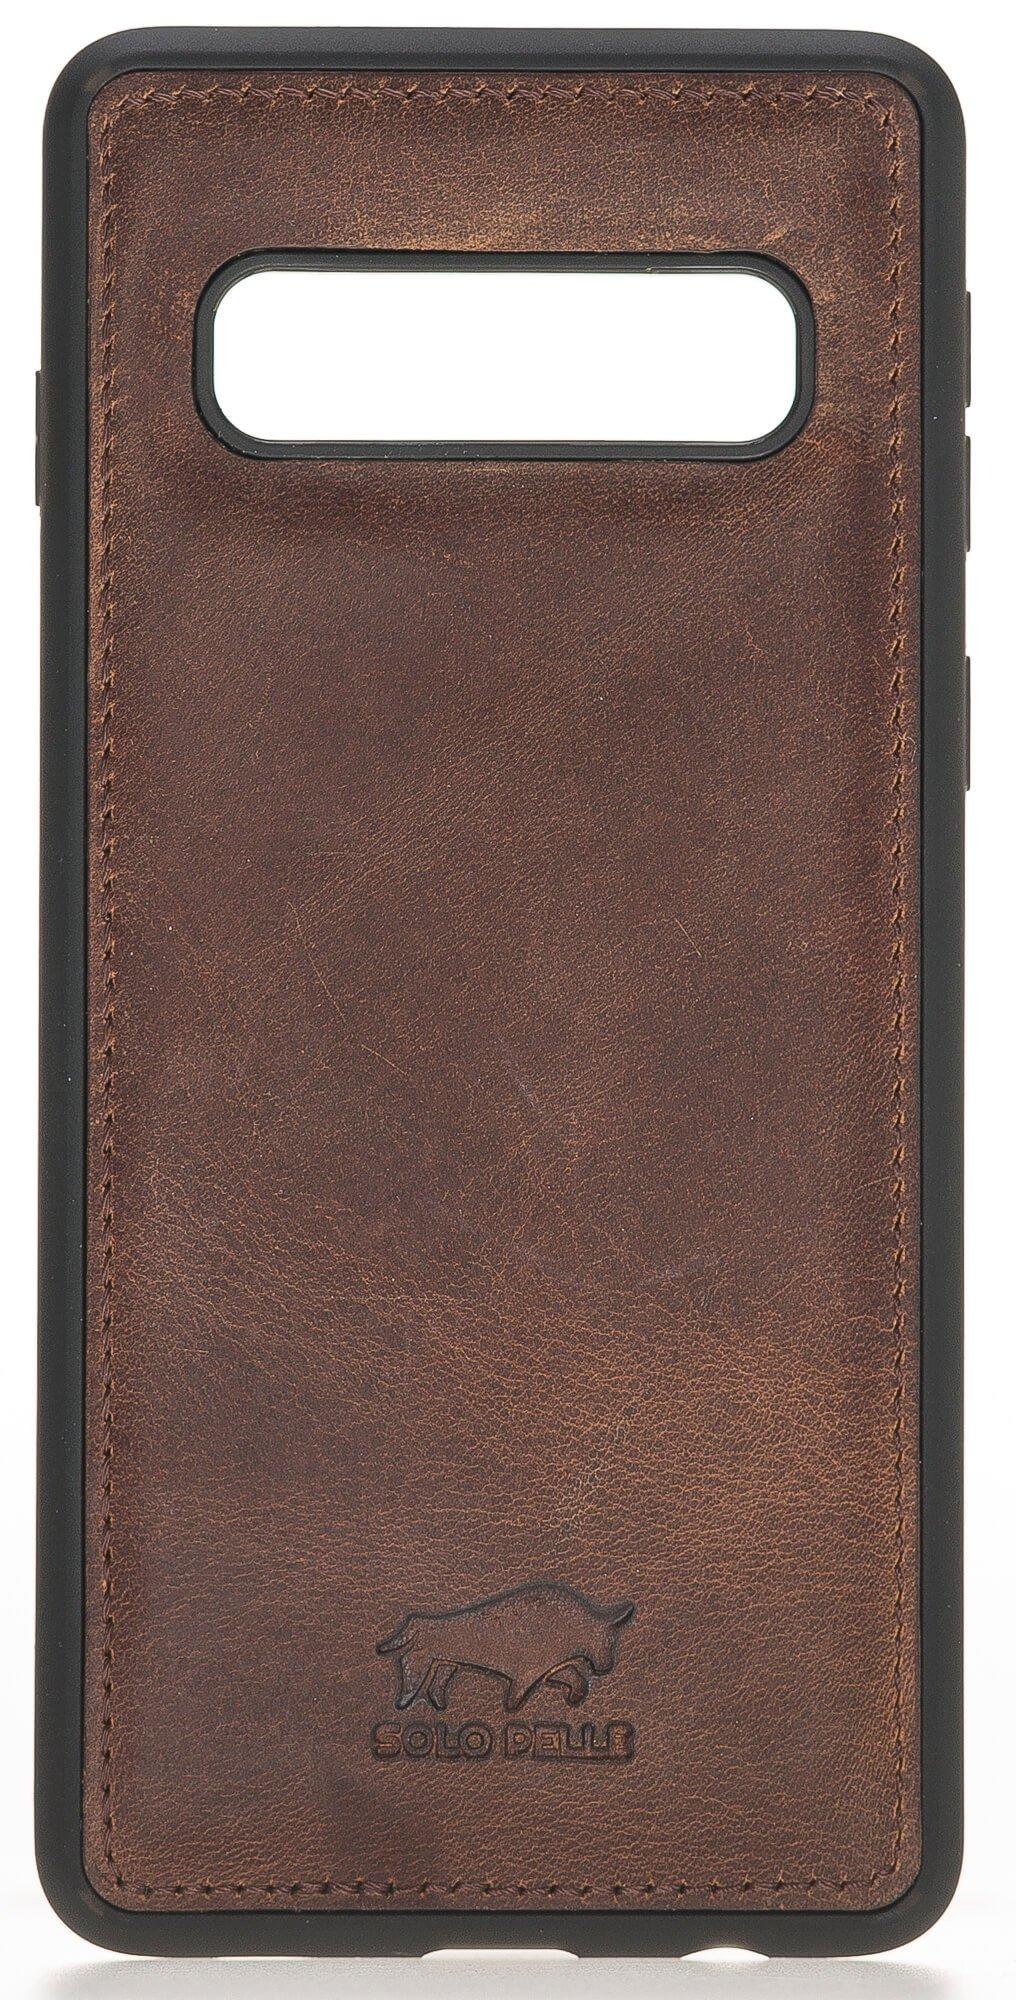 Samsung S10 abnehmbare Lederhülle (2in1) in Vintage Braun Leder Hülle Tasche Lederhülle Ledertasche